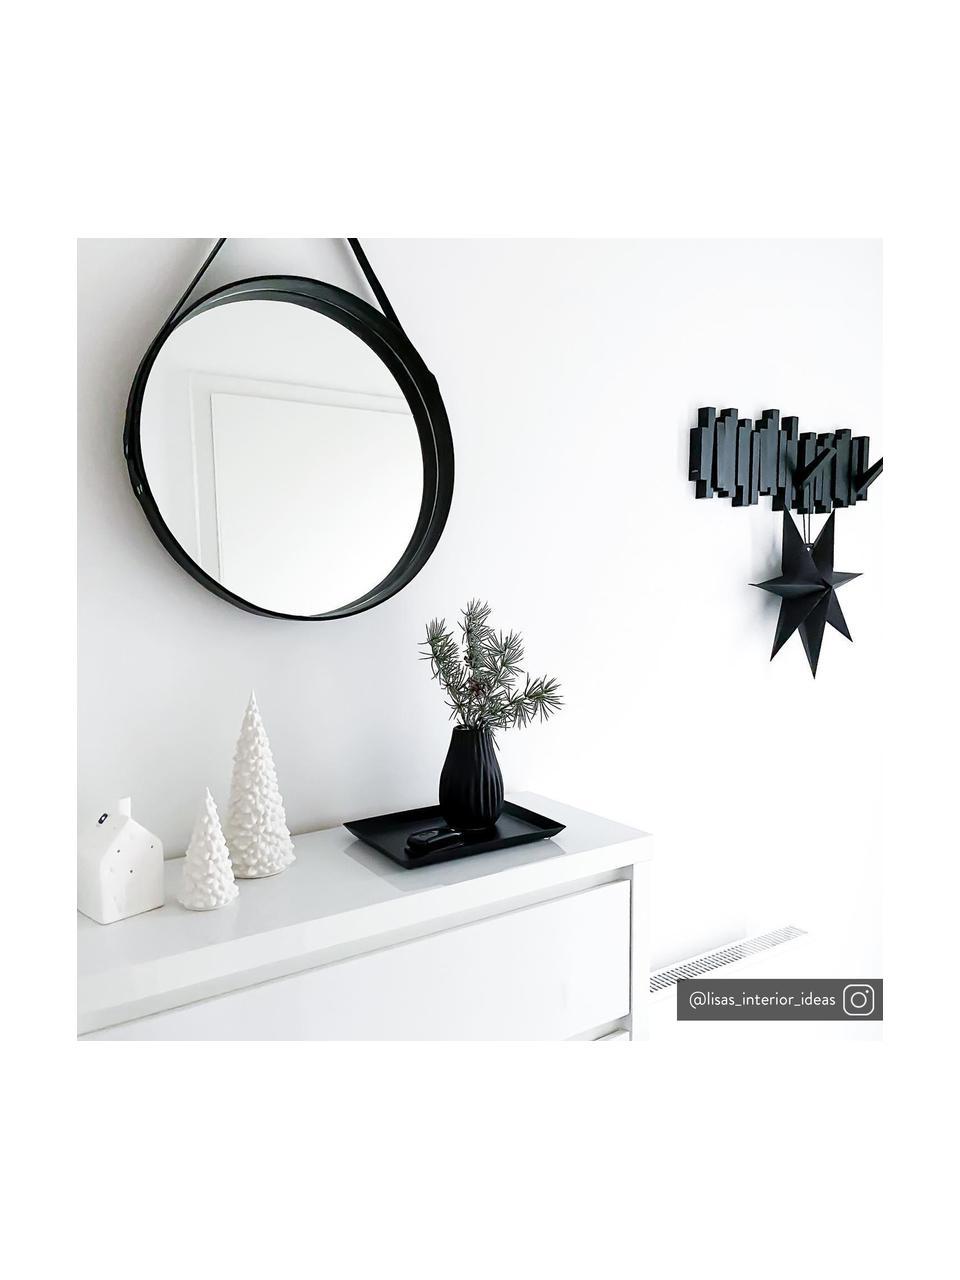 Wandkapstok Sticks in zwart, Kunststof, Zwart, 48 x 18 cm